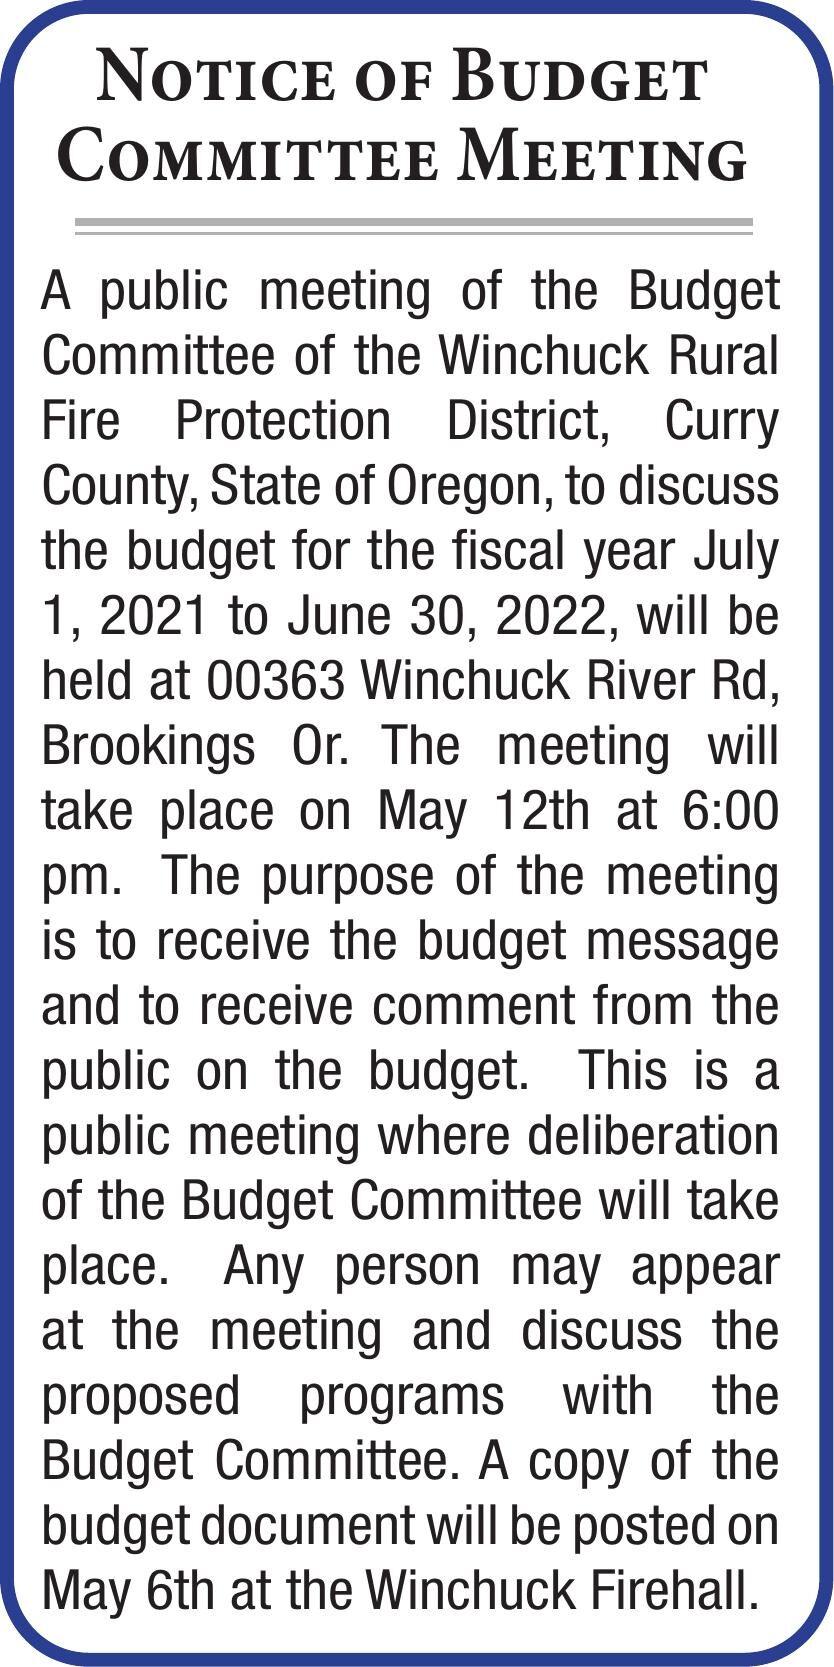 Notice of Budget